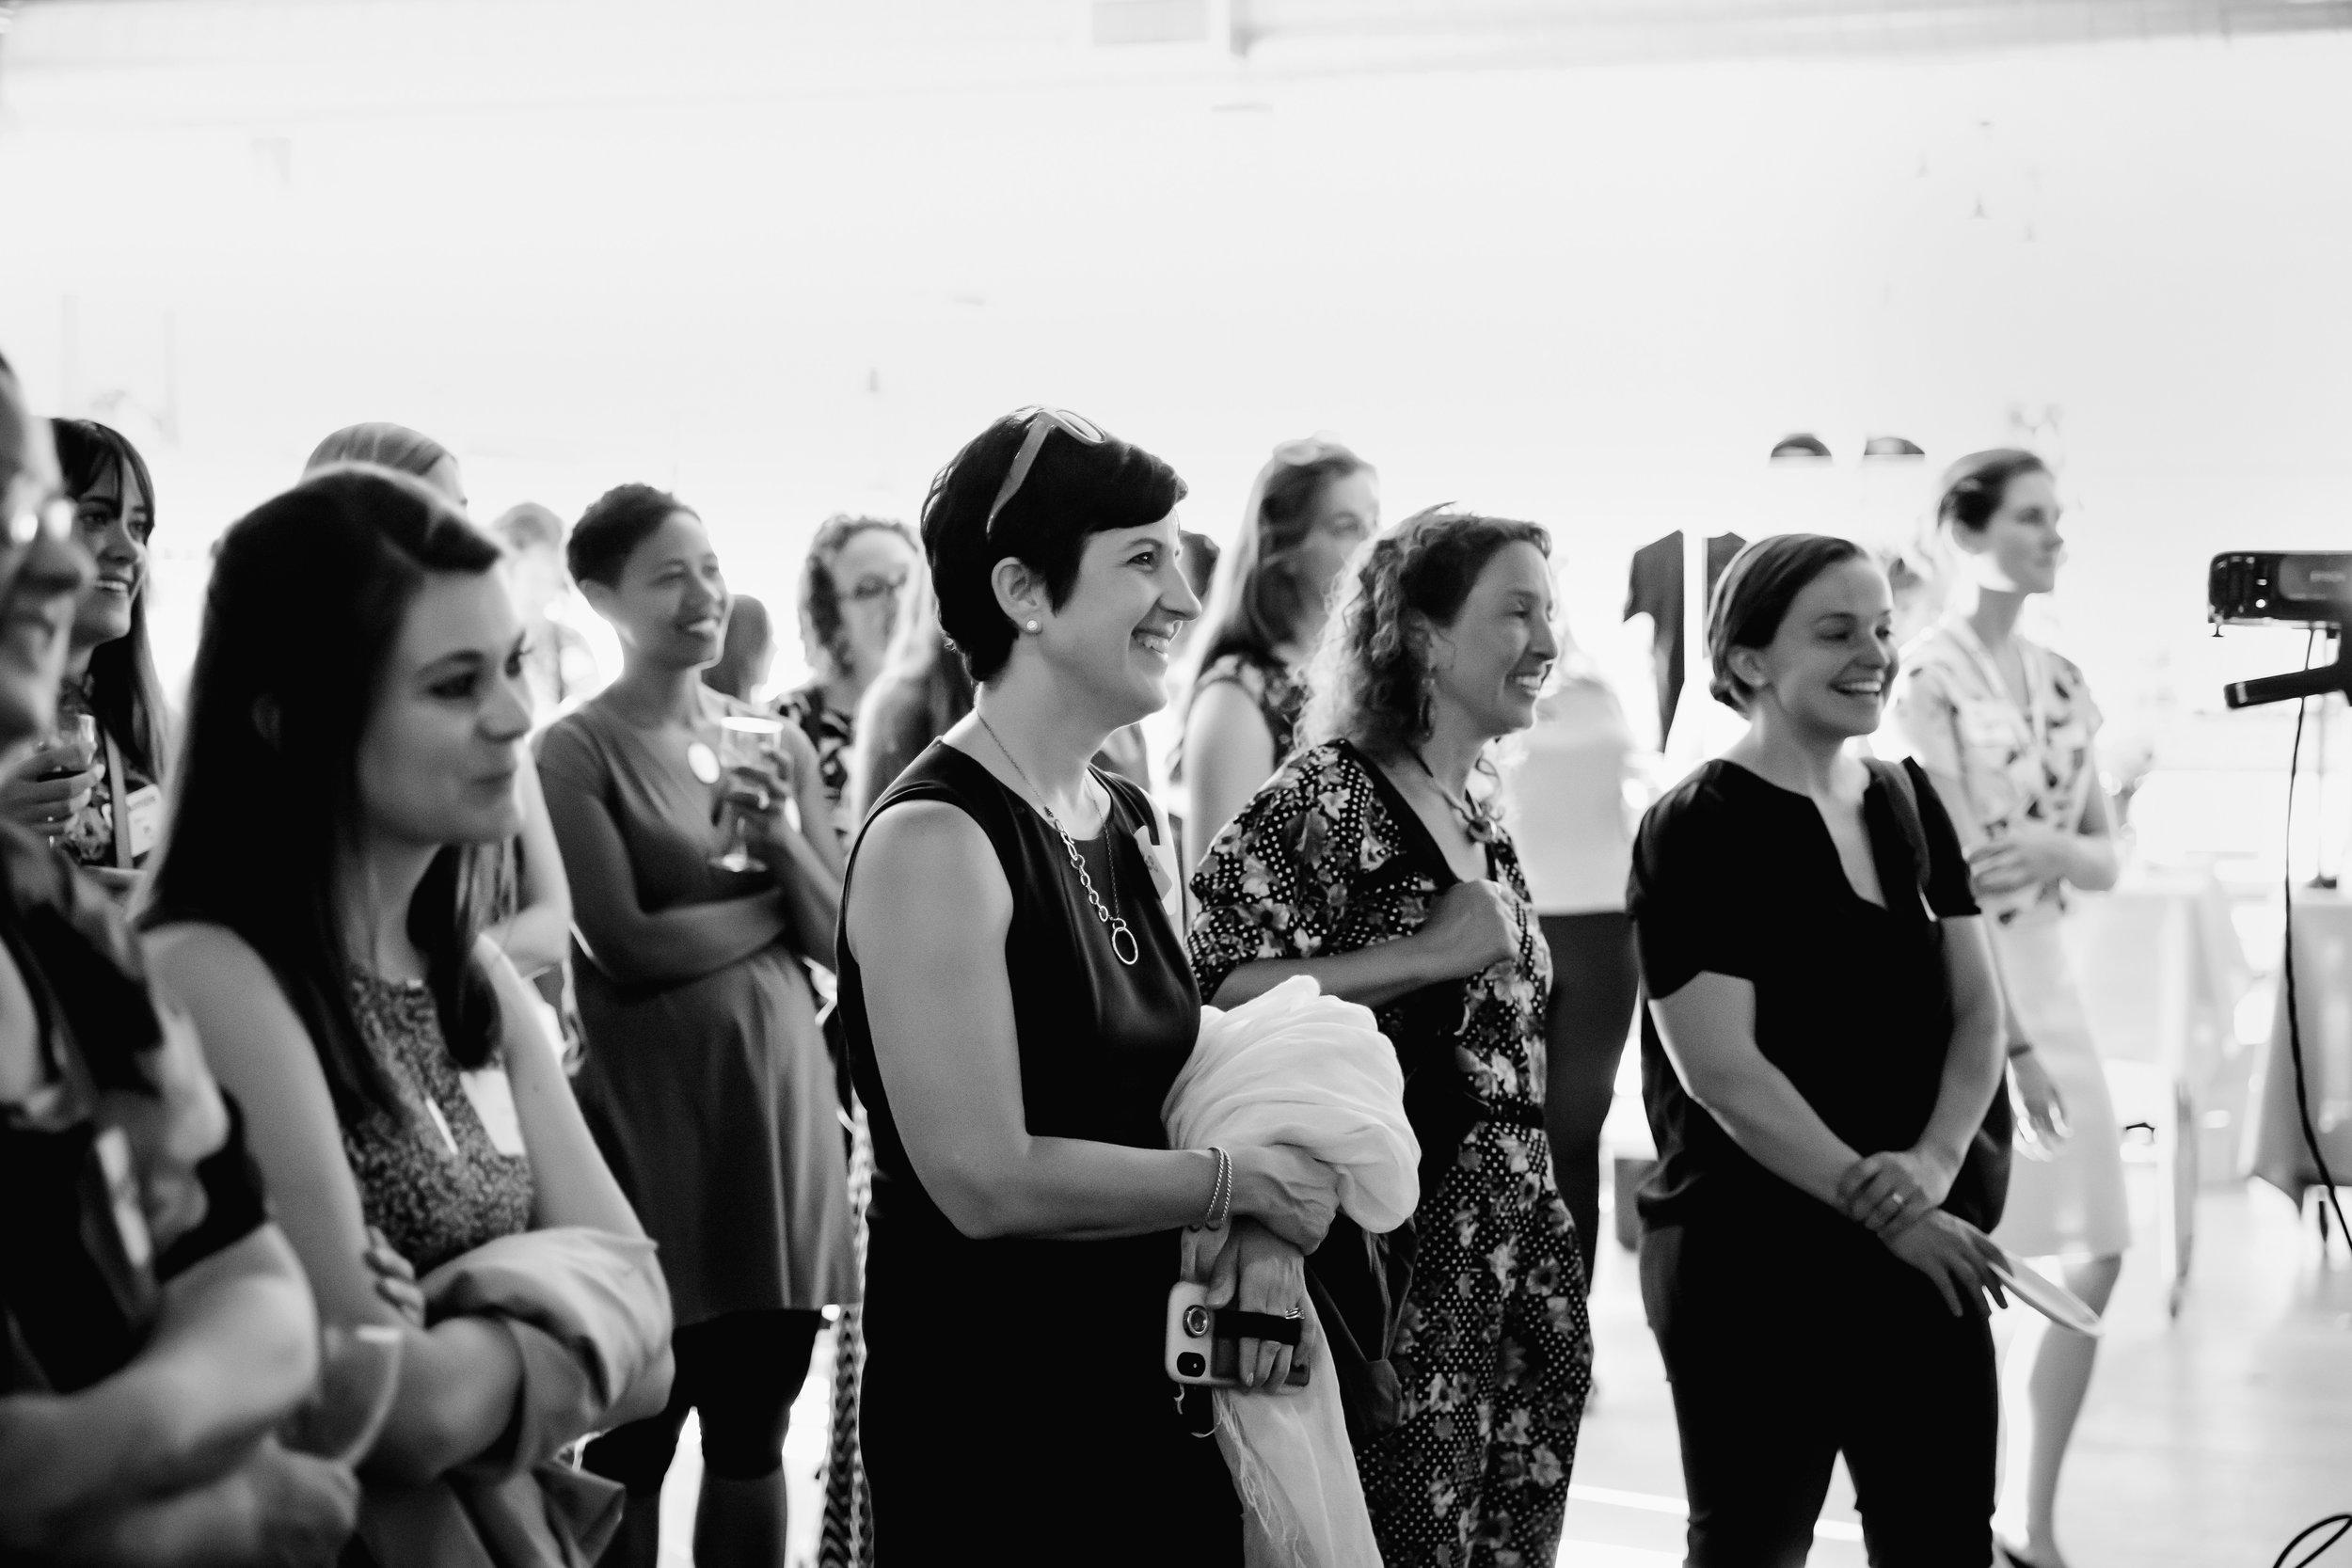 Women_of_EV_Annual_Summit_2019-8209.jpg